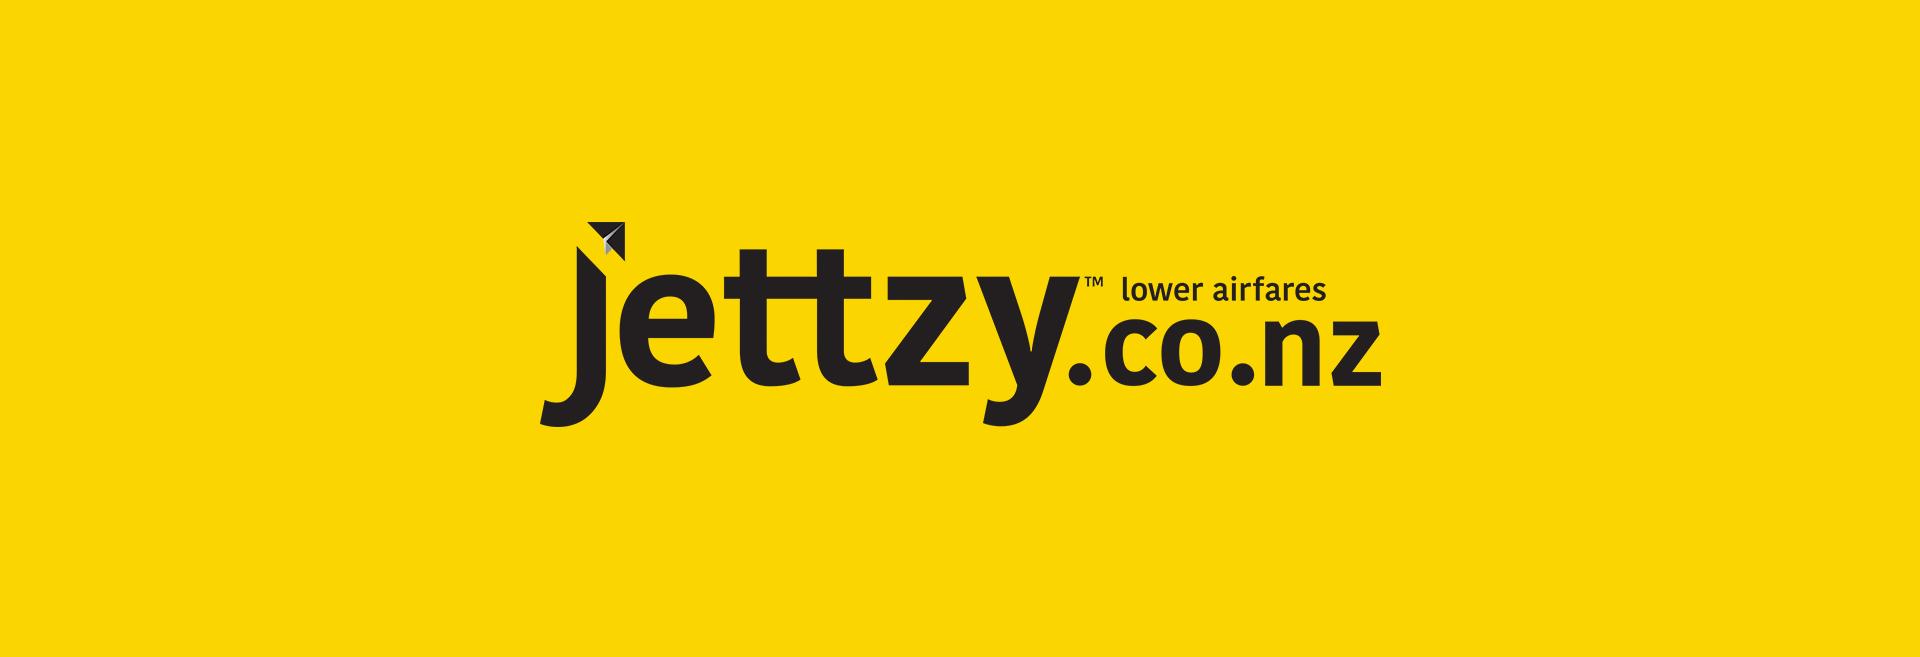 REDFIRE_branding_packaging_digital_design_Jettzy.co.nz_Logo_Level01b